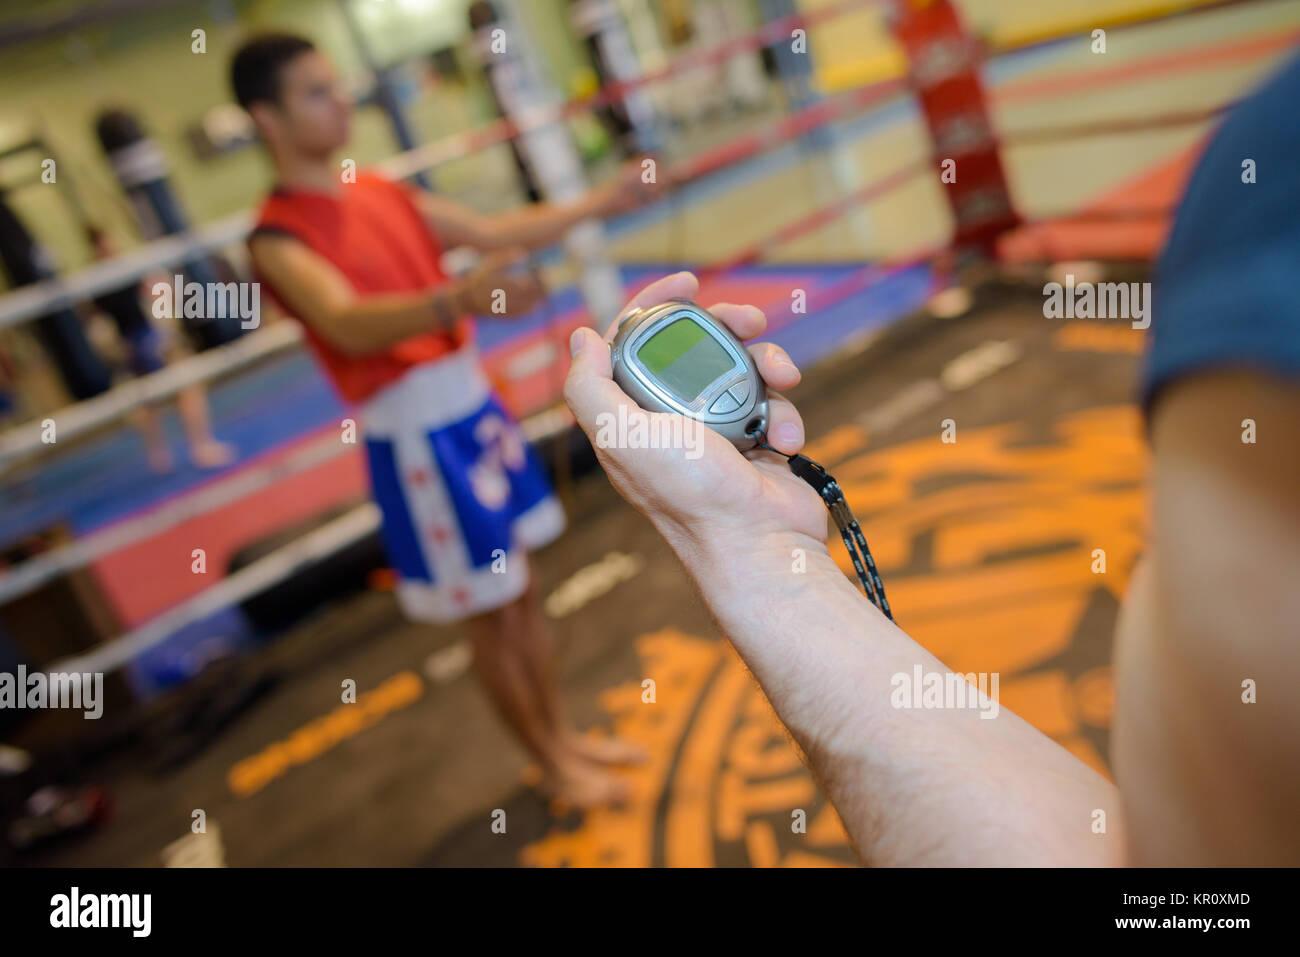 cardio exercise - Stock Image